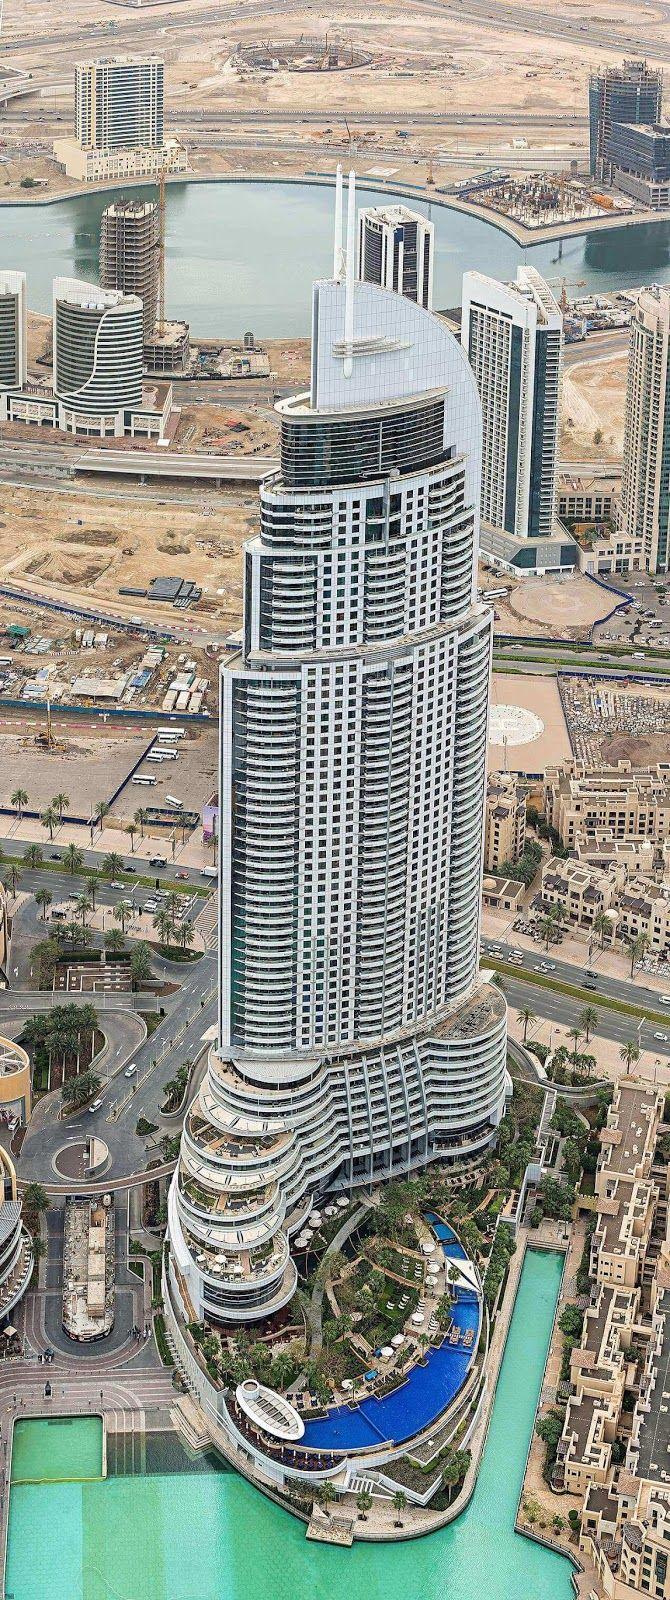 Ramada Downtown Dubai hotel fantastic views from the Burj Khalifa building. Top 10 Amazing Dubai Attractions - Explore Things to Do in Dubai #luxurydubai